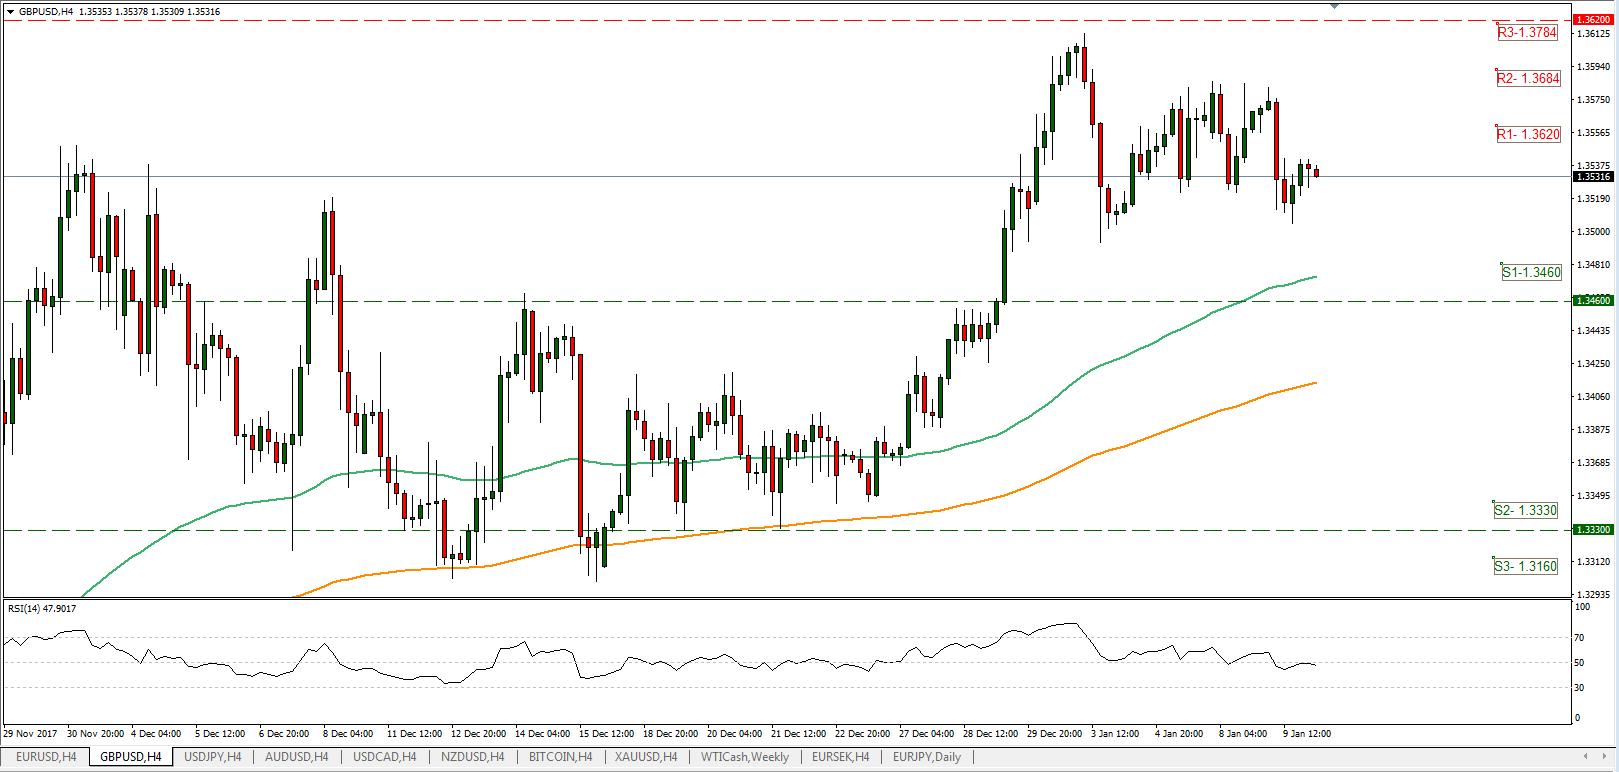 GBP/USD 10/01/2018 | Econ Alerts